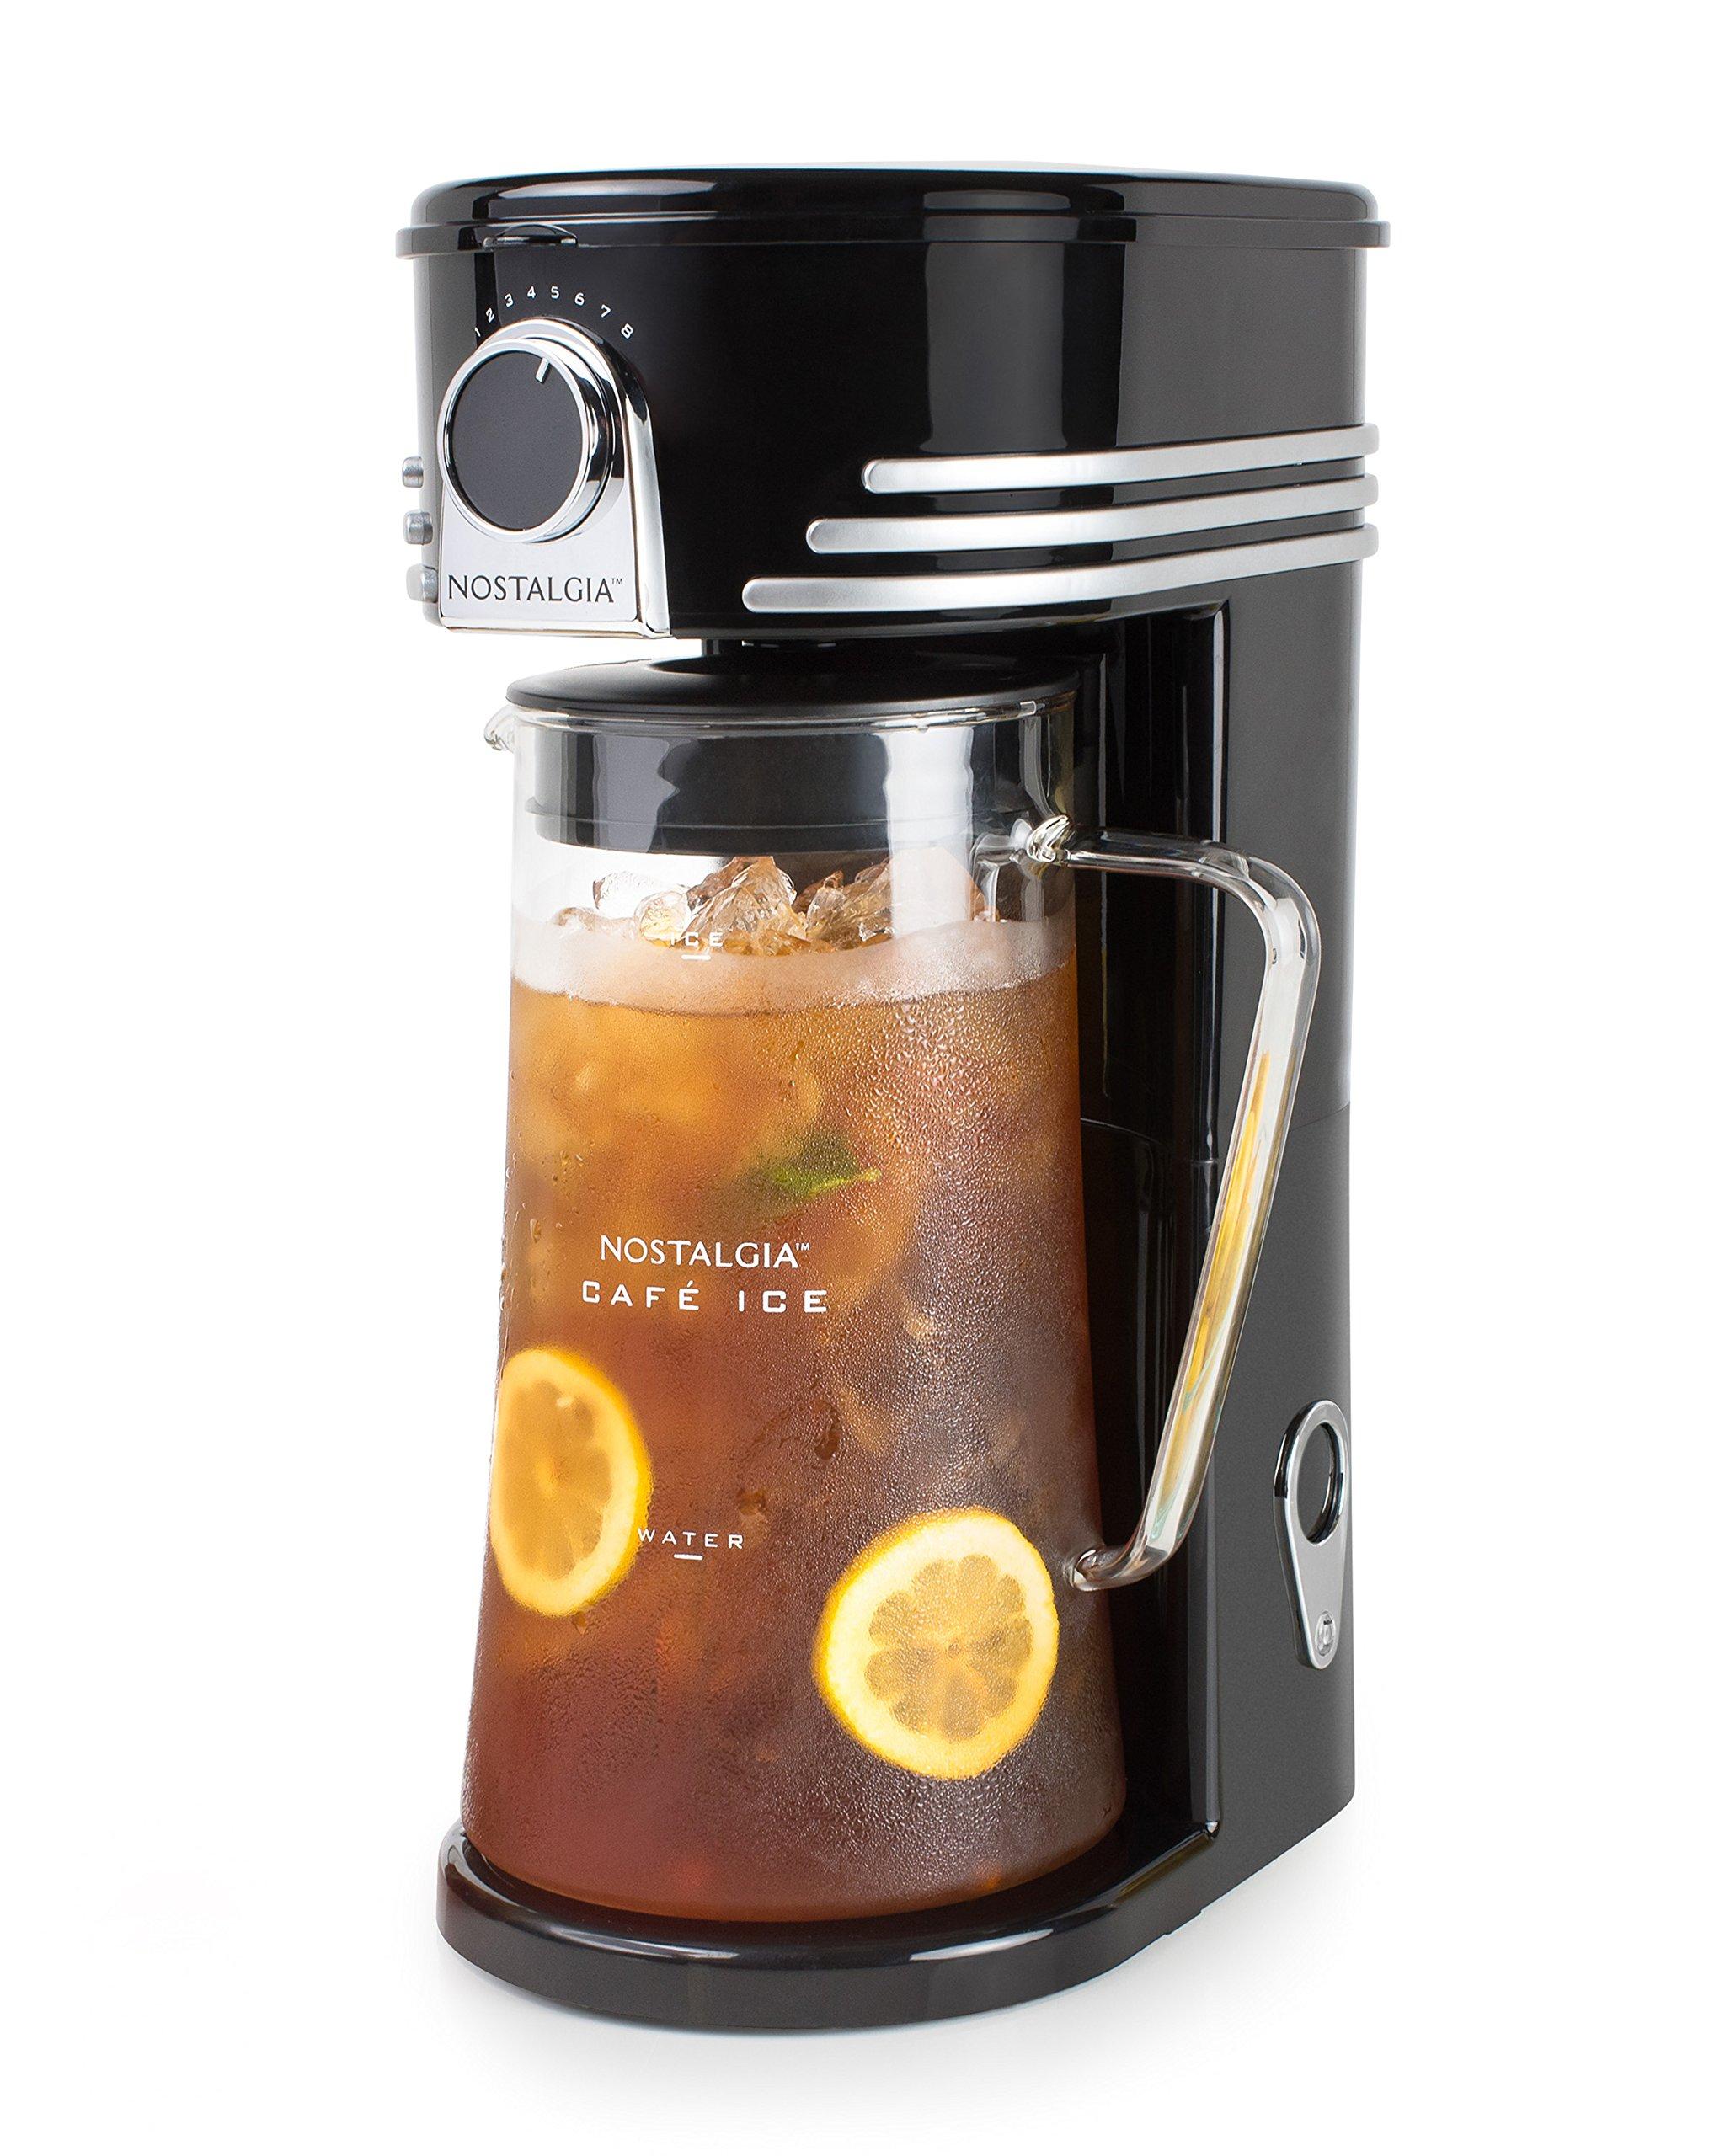 Nostalgia CI3BK Iced Coffee Maker and Tea Brewing System, Glass Pitcher, 3 quart, Black by NOSTALGIA